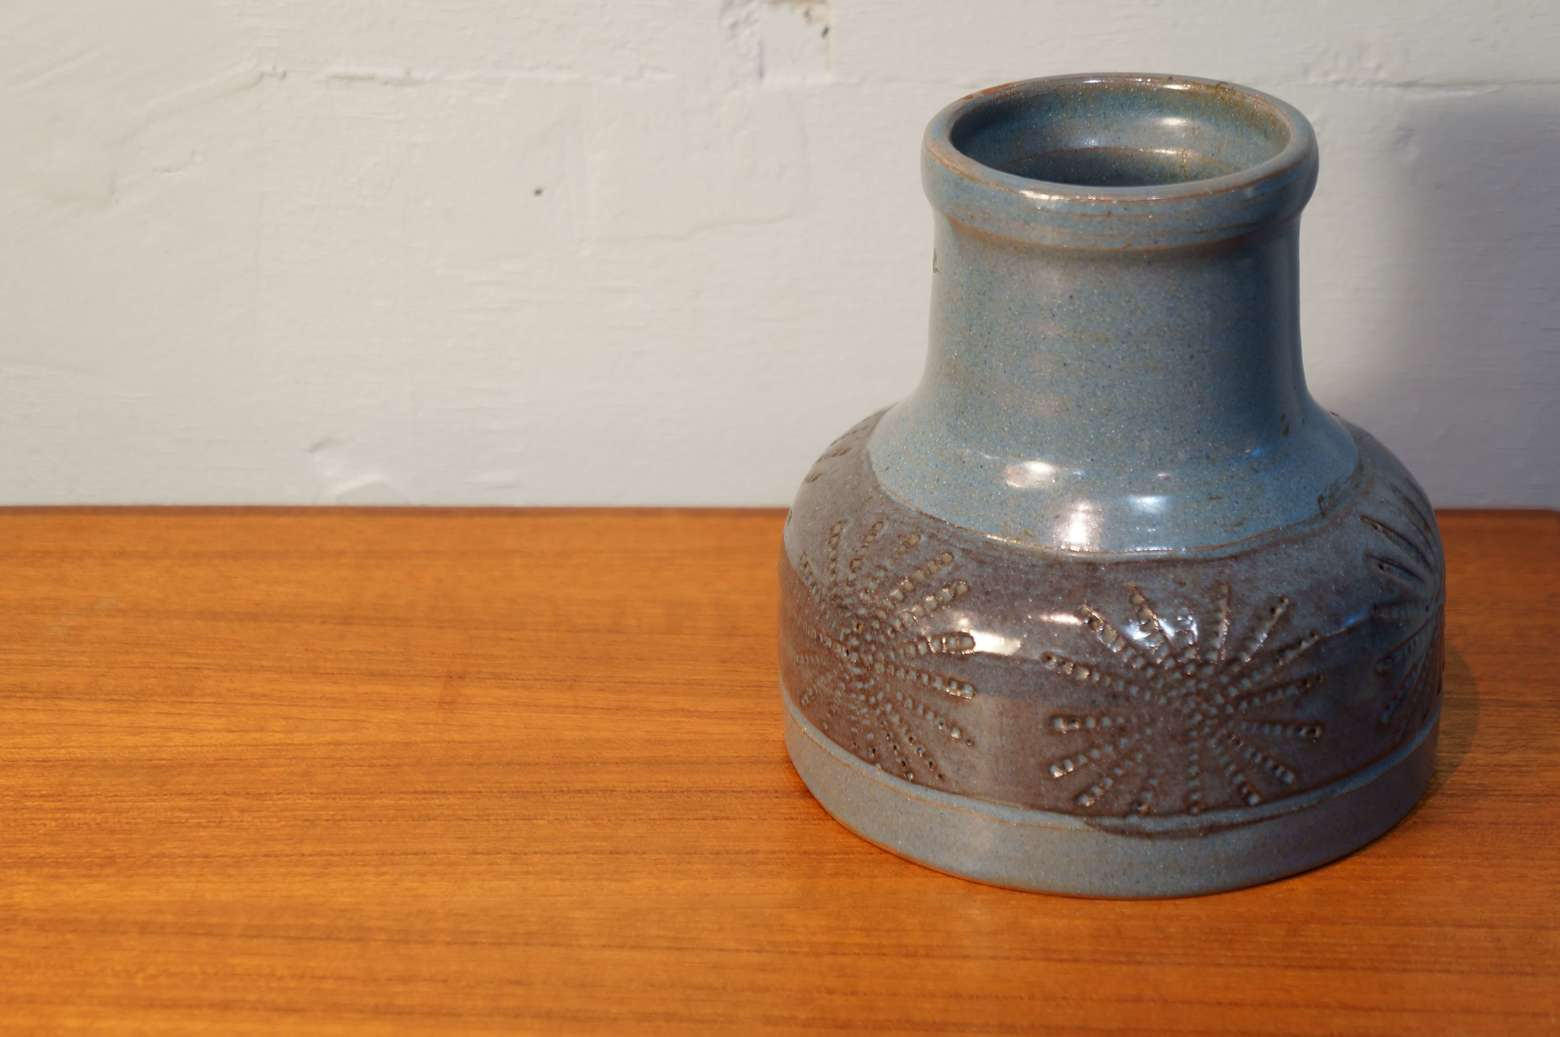 Scandinavian Vinatage Flower Vase Light Blue/北欧ヴィンテージ フラワーベース ライトブルー